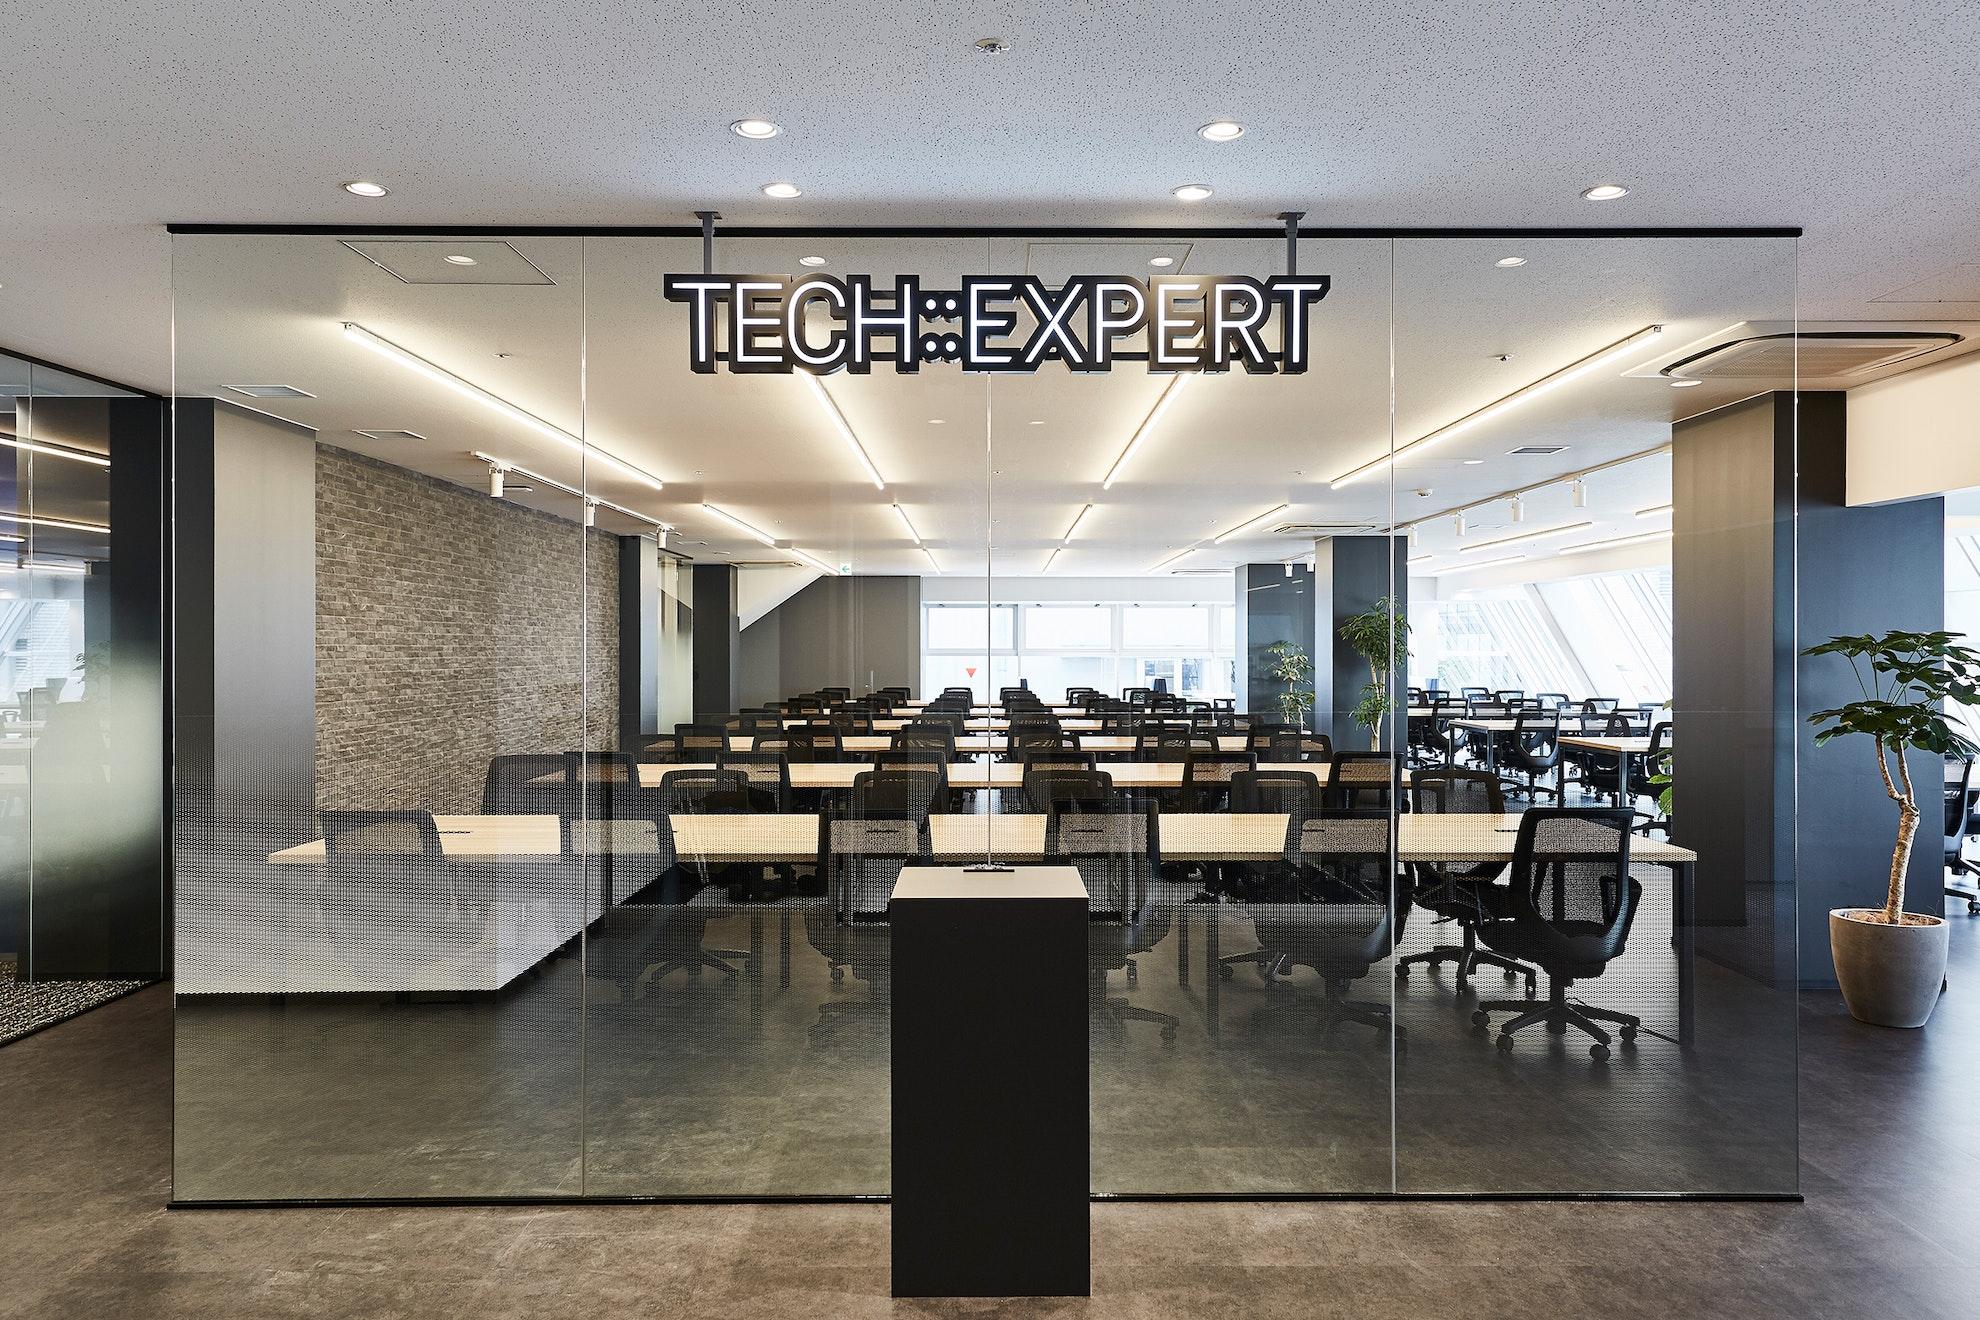 TECH::EXPERT 渋谷フレーム神南坂校 のサムネイル